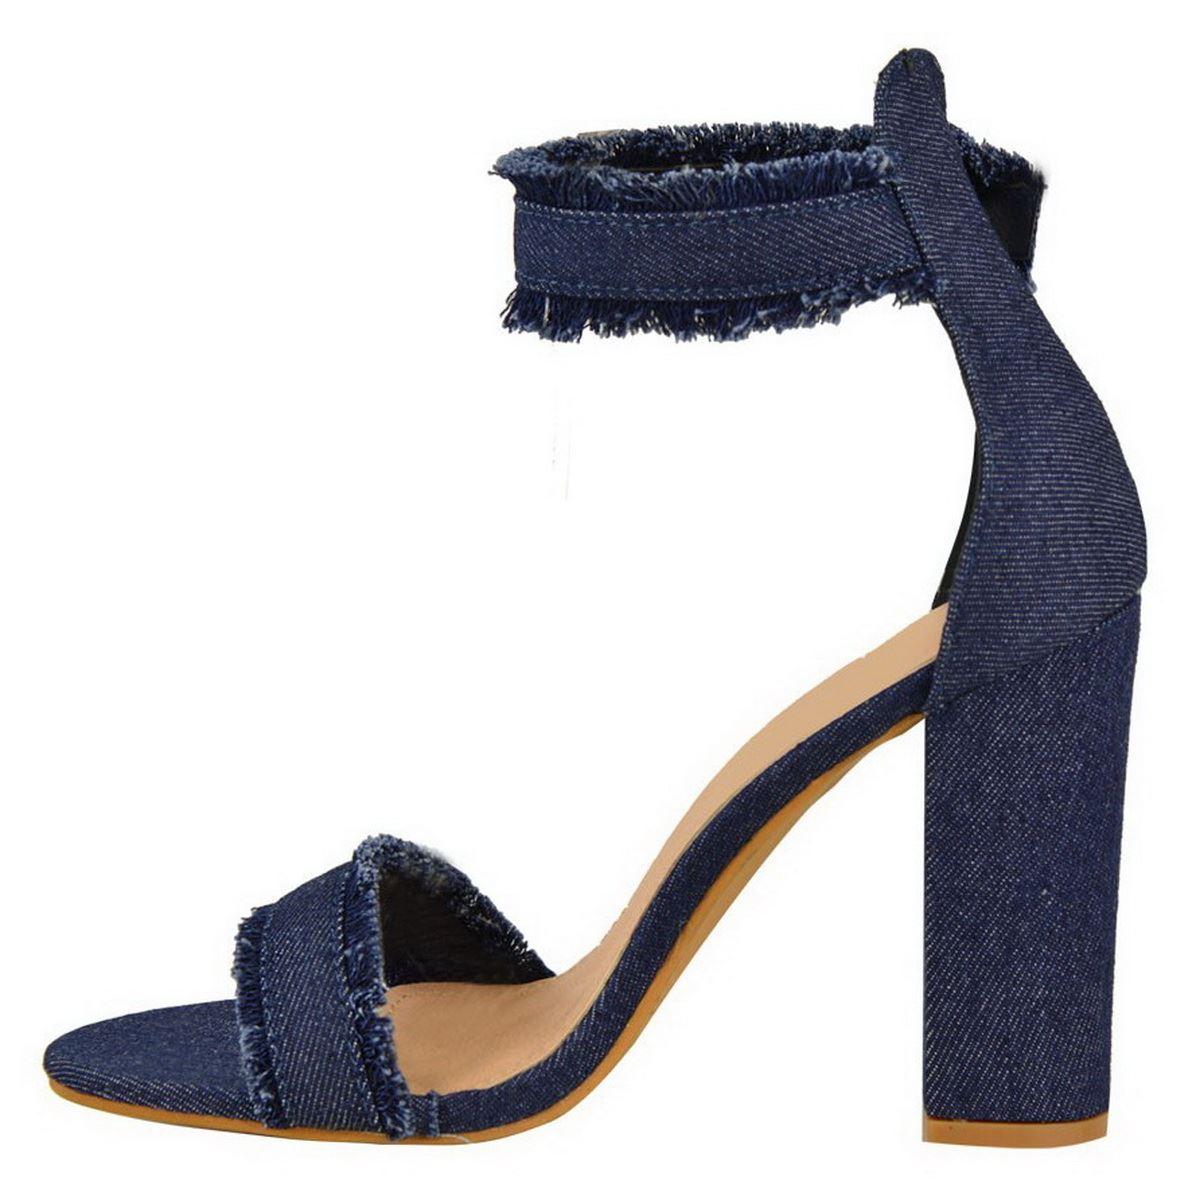 Ankle Strap Shoes Slim Block Heel  Uk